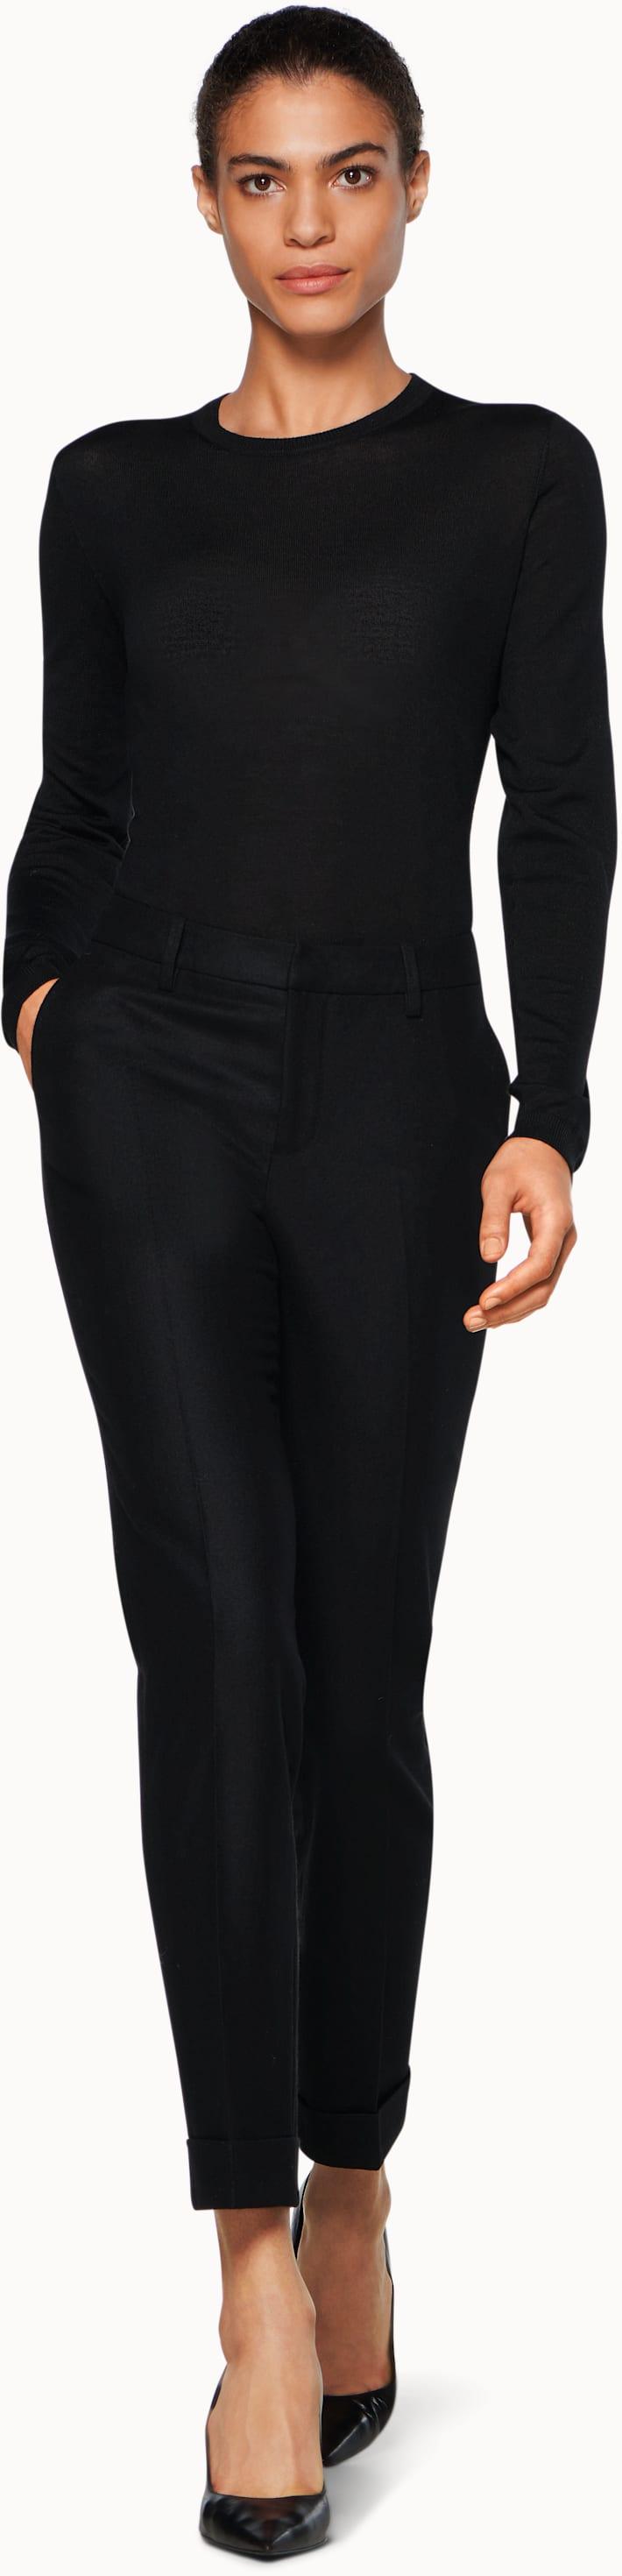 Robin Black Trousers